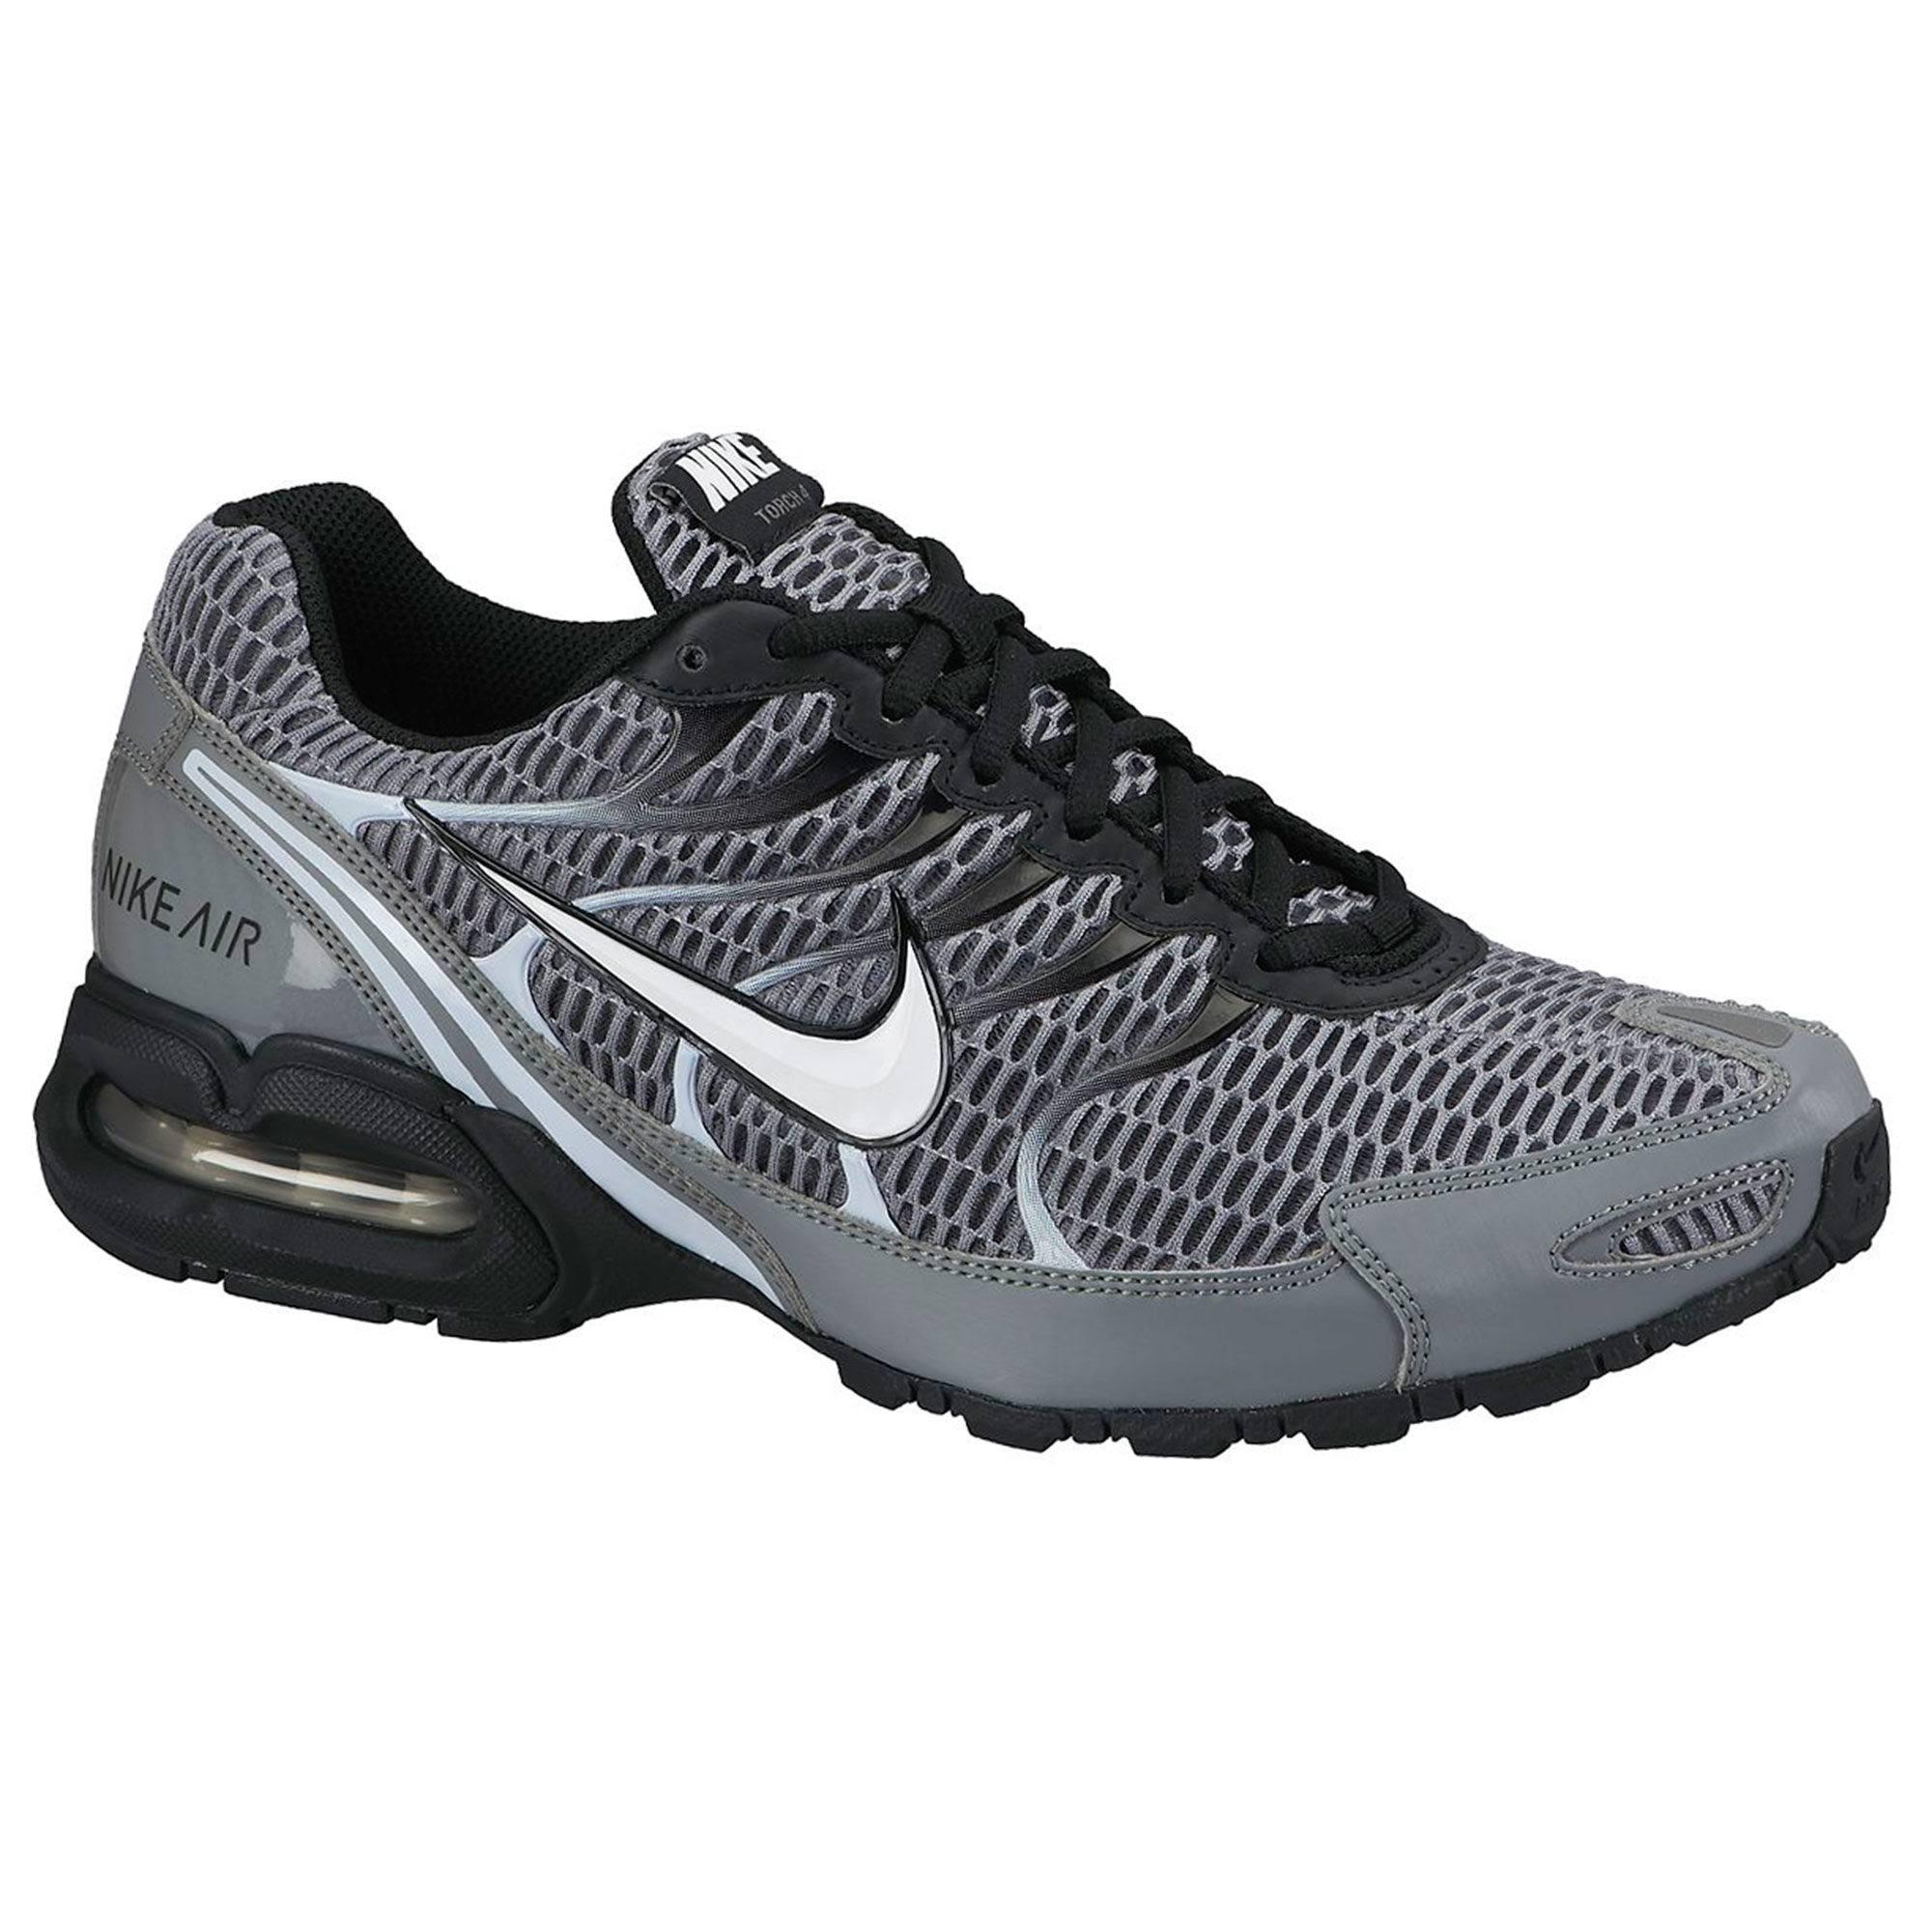 white 4 Running Grey Cool black Torch Shoe Grey Men's Max Nike Air wqpxCvpf